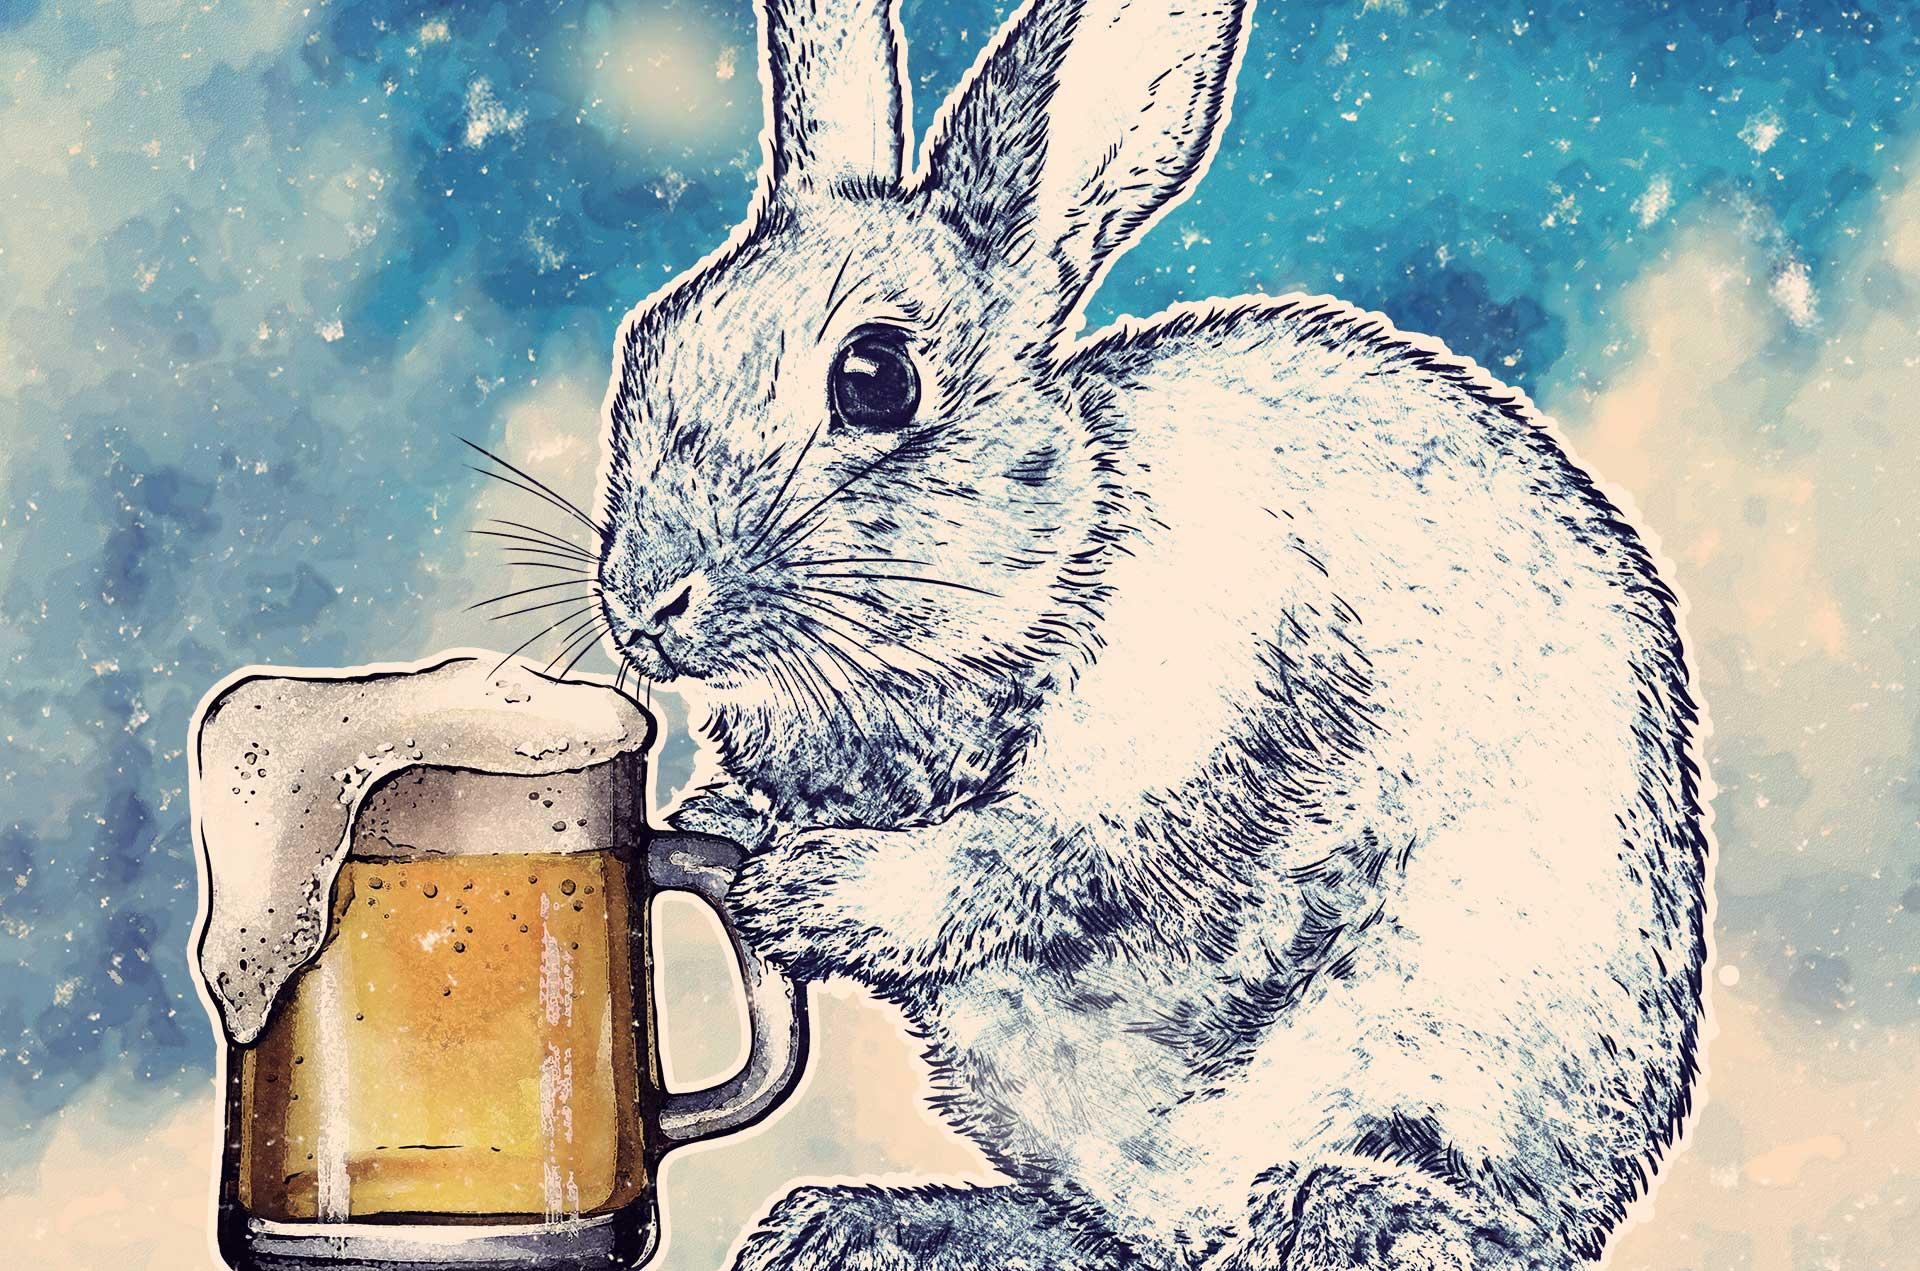 Komm trink mit mir Schneehas Bier